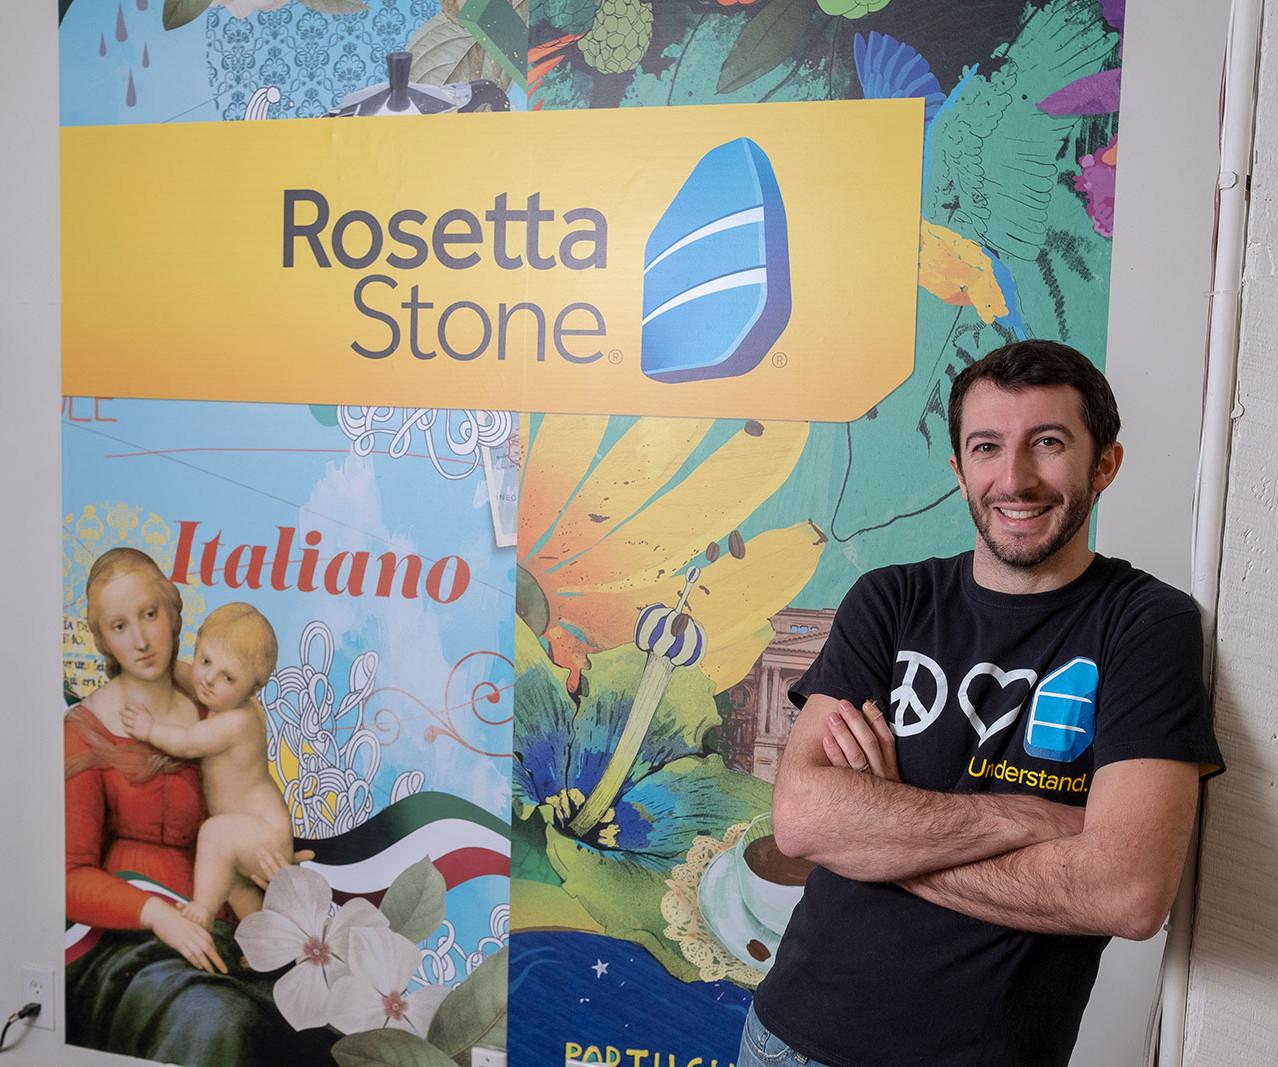 Rosetta-stone--90